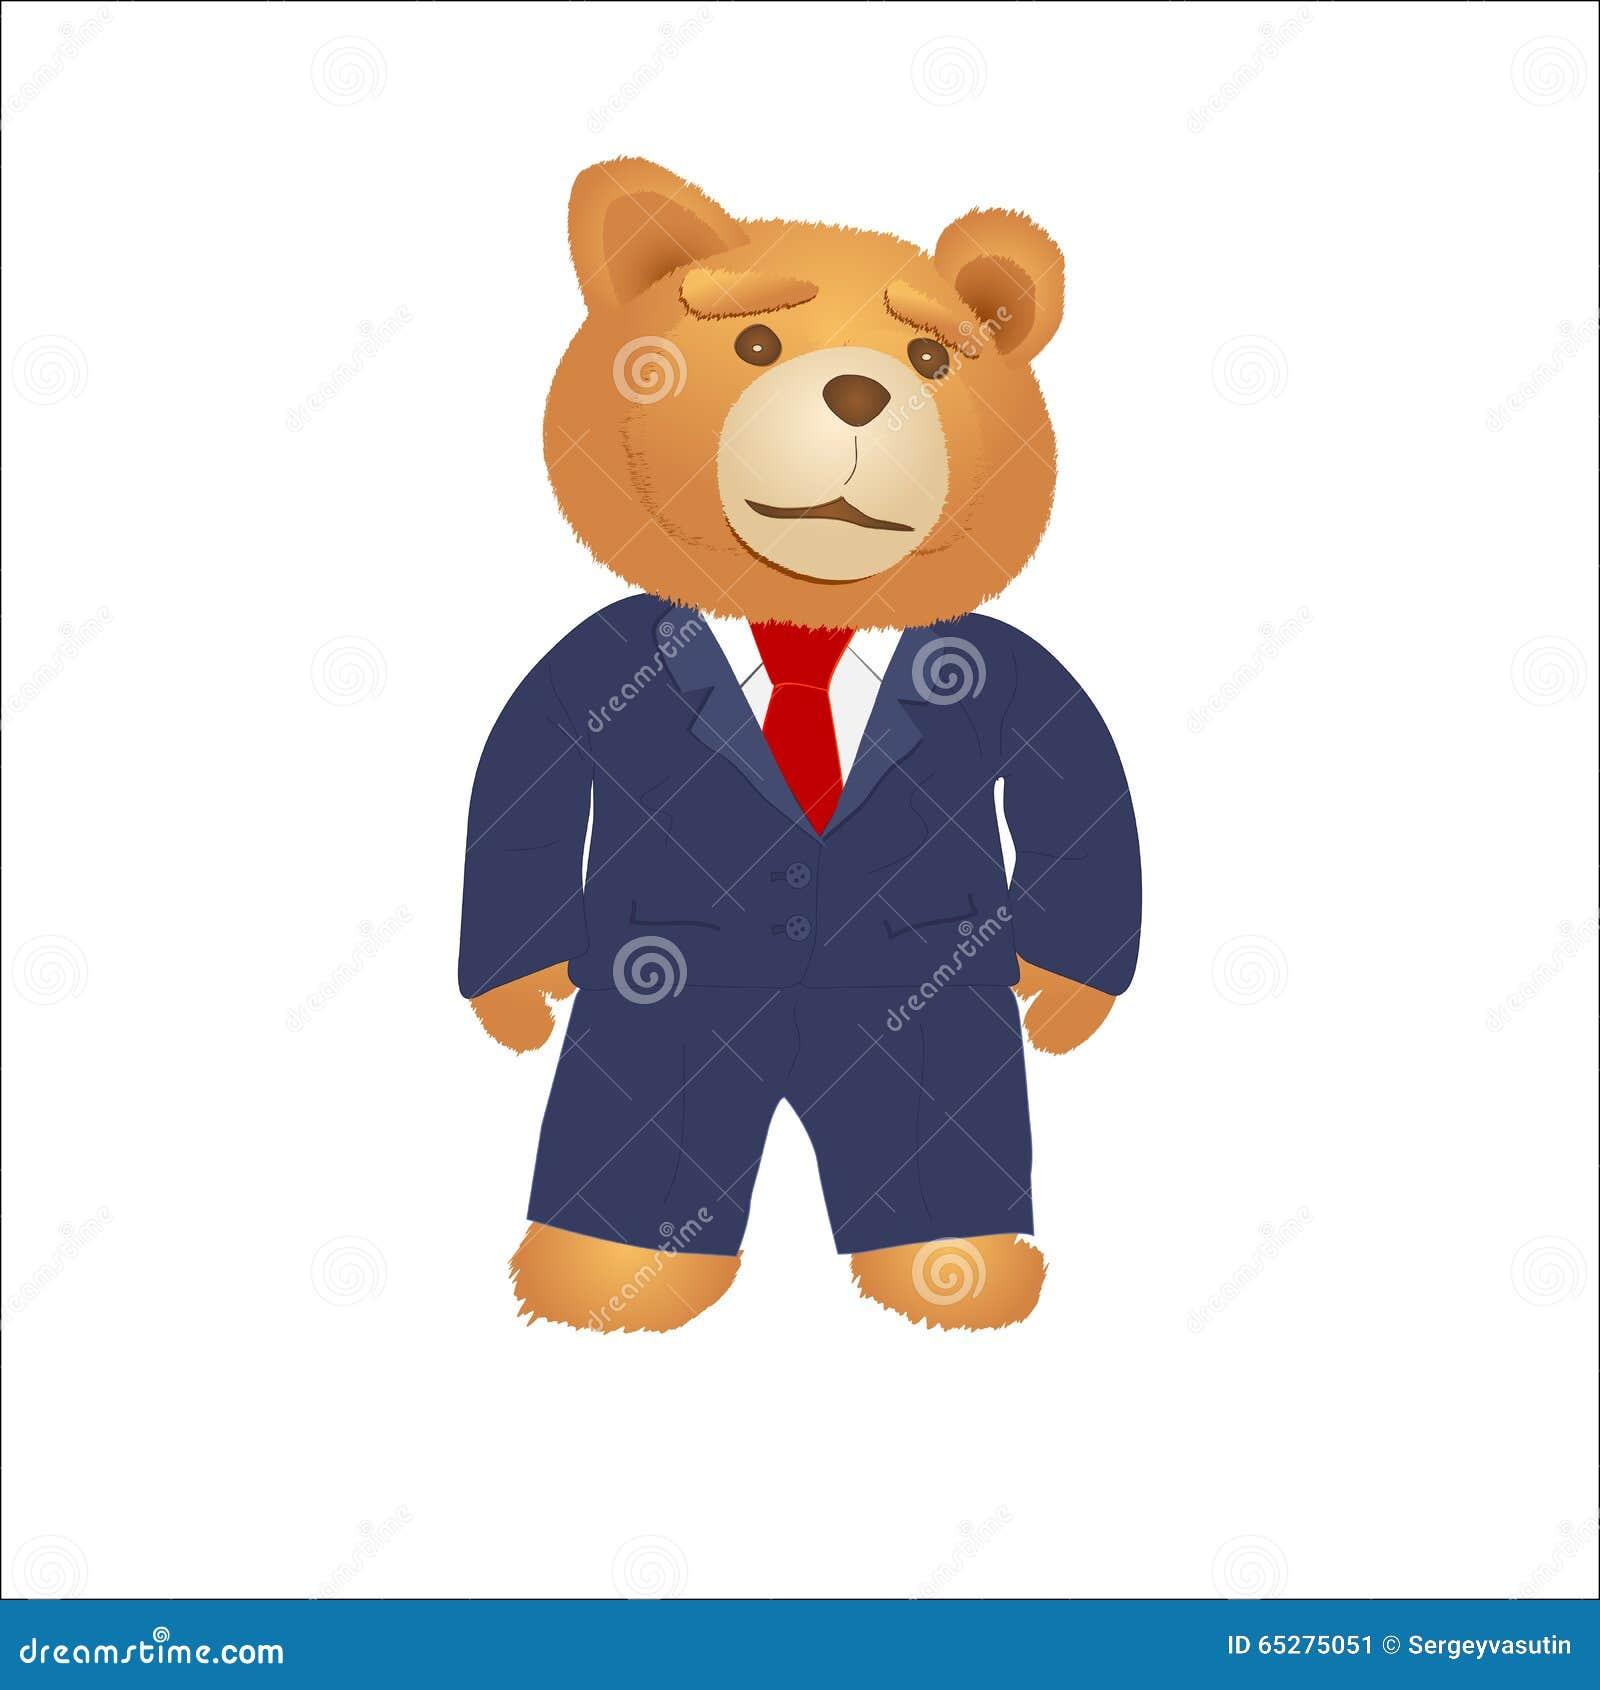 Cute Cartoon Teddy Bear Vector Illustration Download Teddy